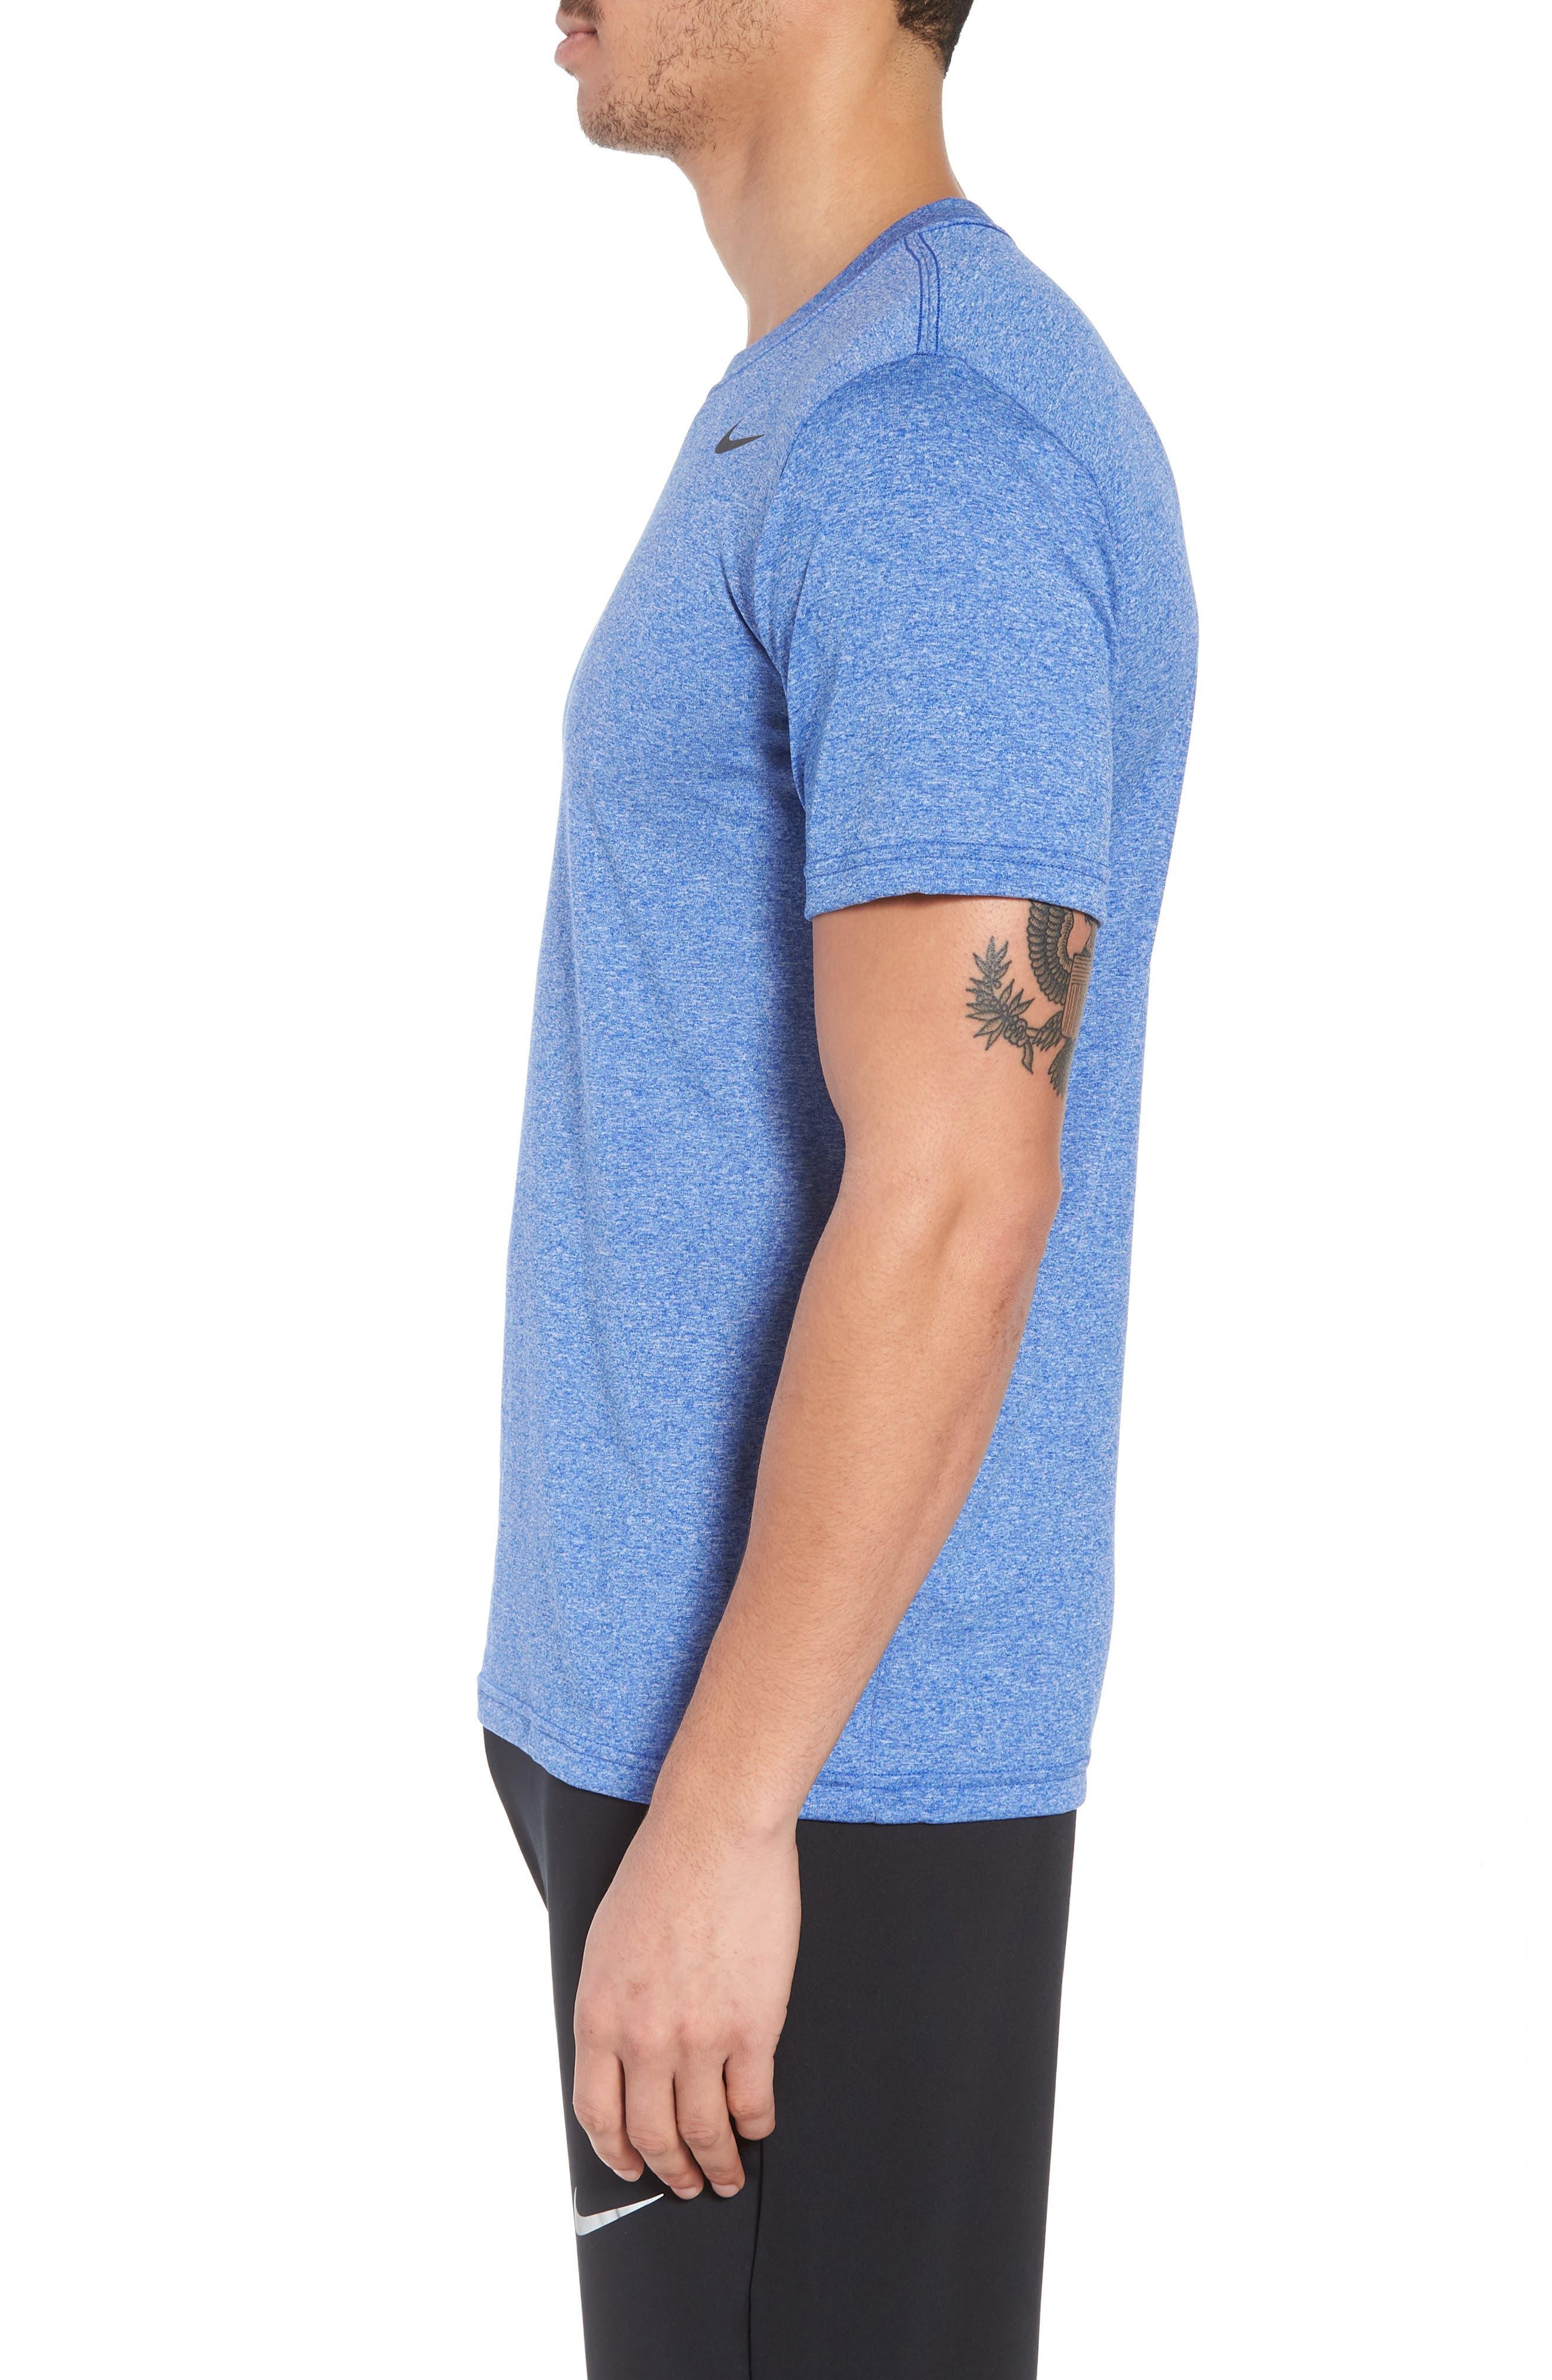 Alternate Image 3  - Nike 'Legend 2.0' Dri-FIT Training T-Shirt